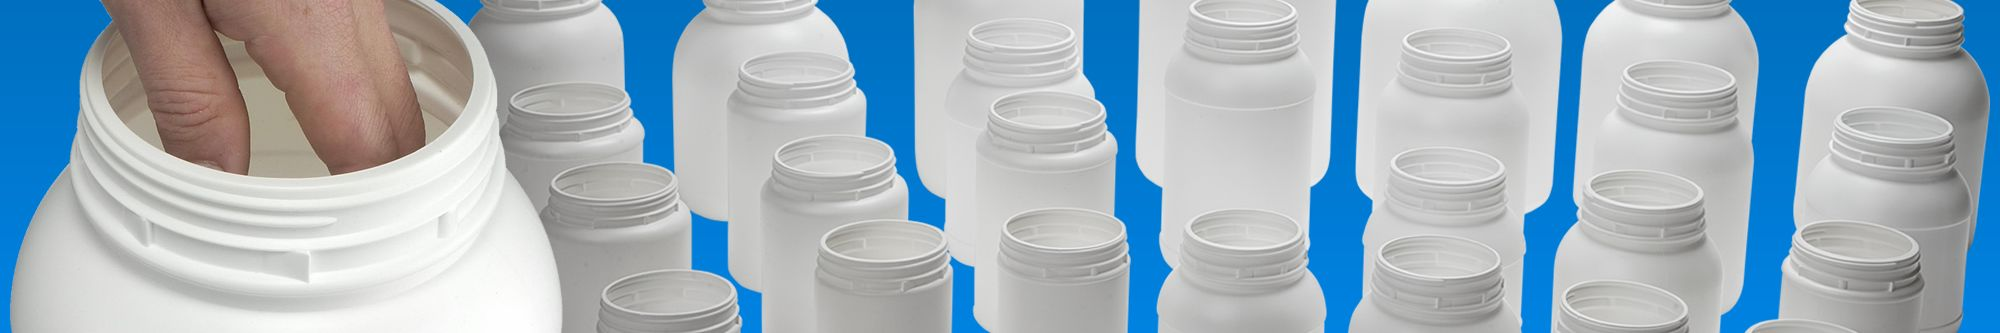 Widemouth jars